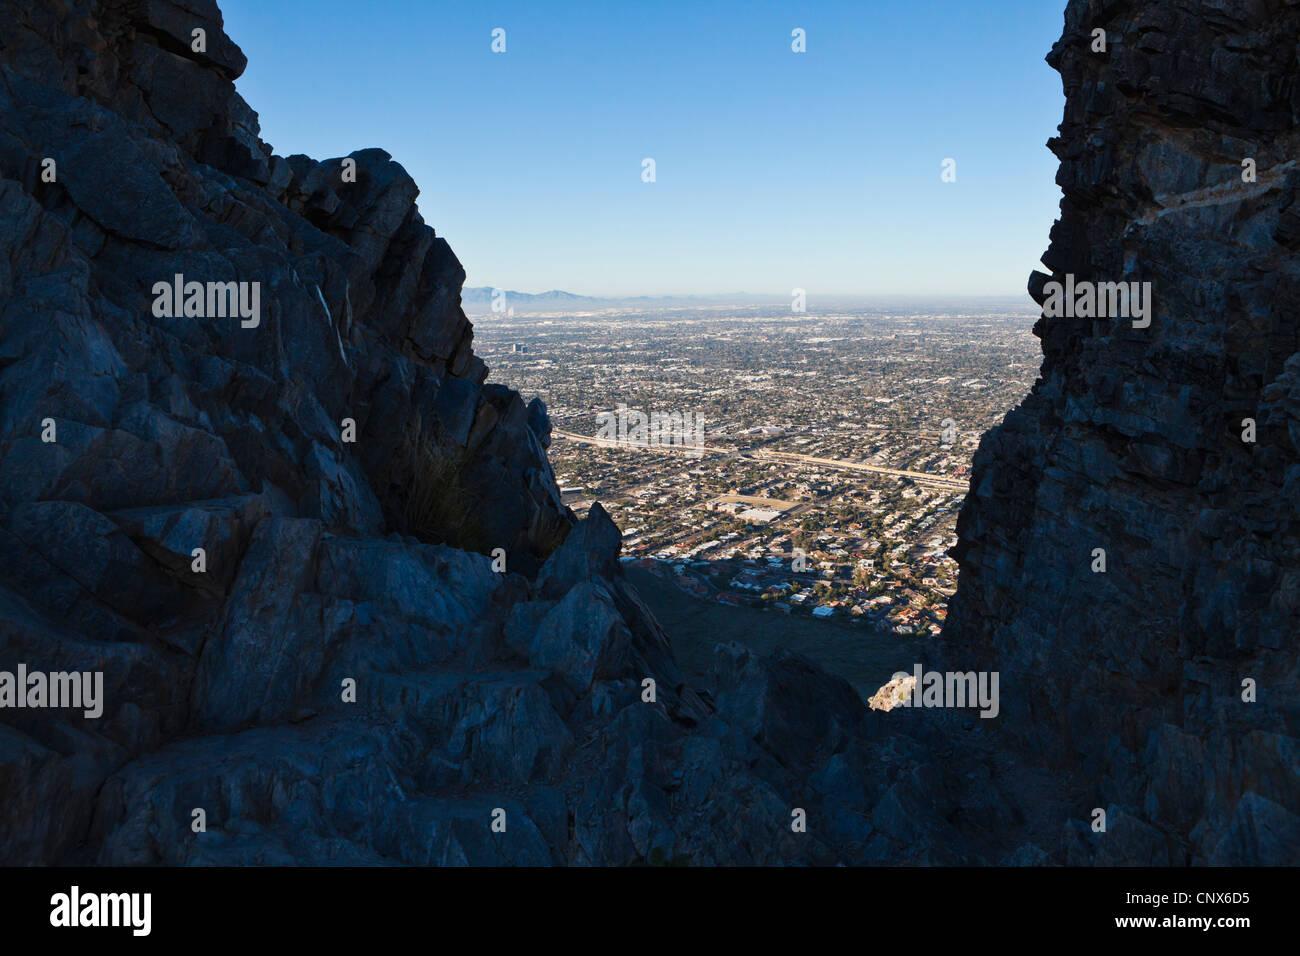 Phoenix, Arizona seen from the top of Piestewa Peak. - Stock Image